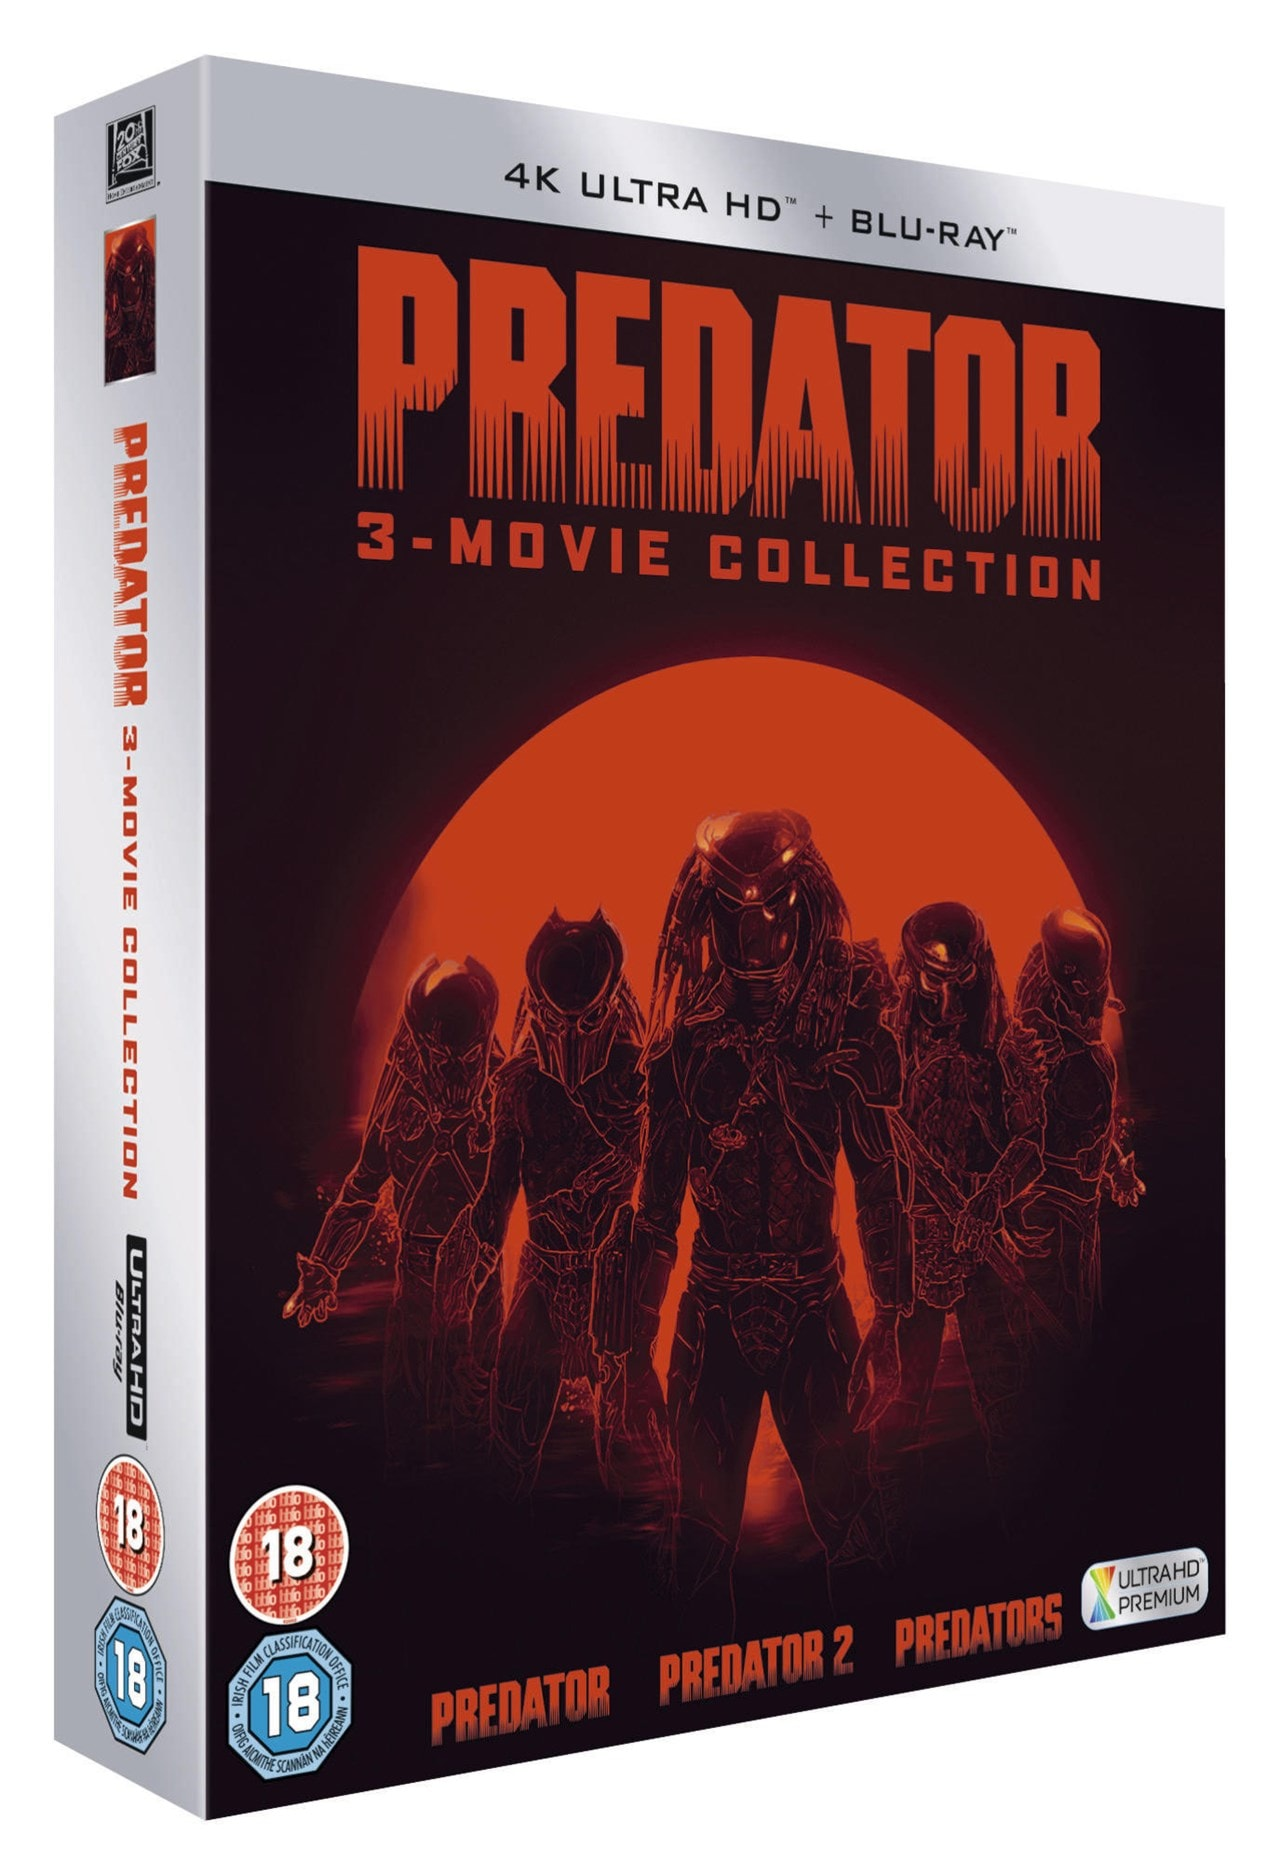 Predator Trilogy - 2